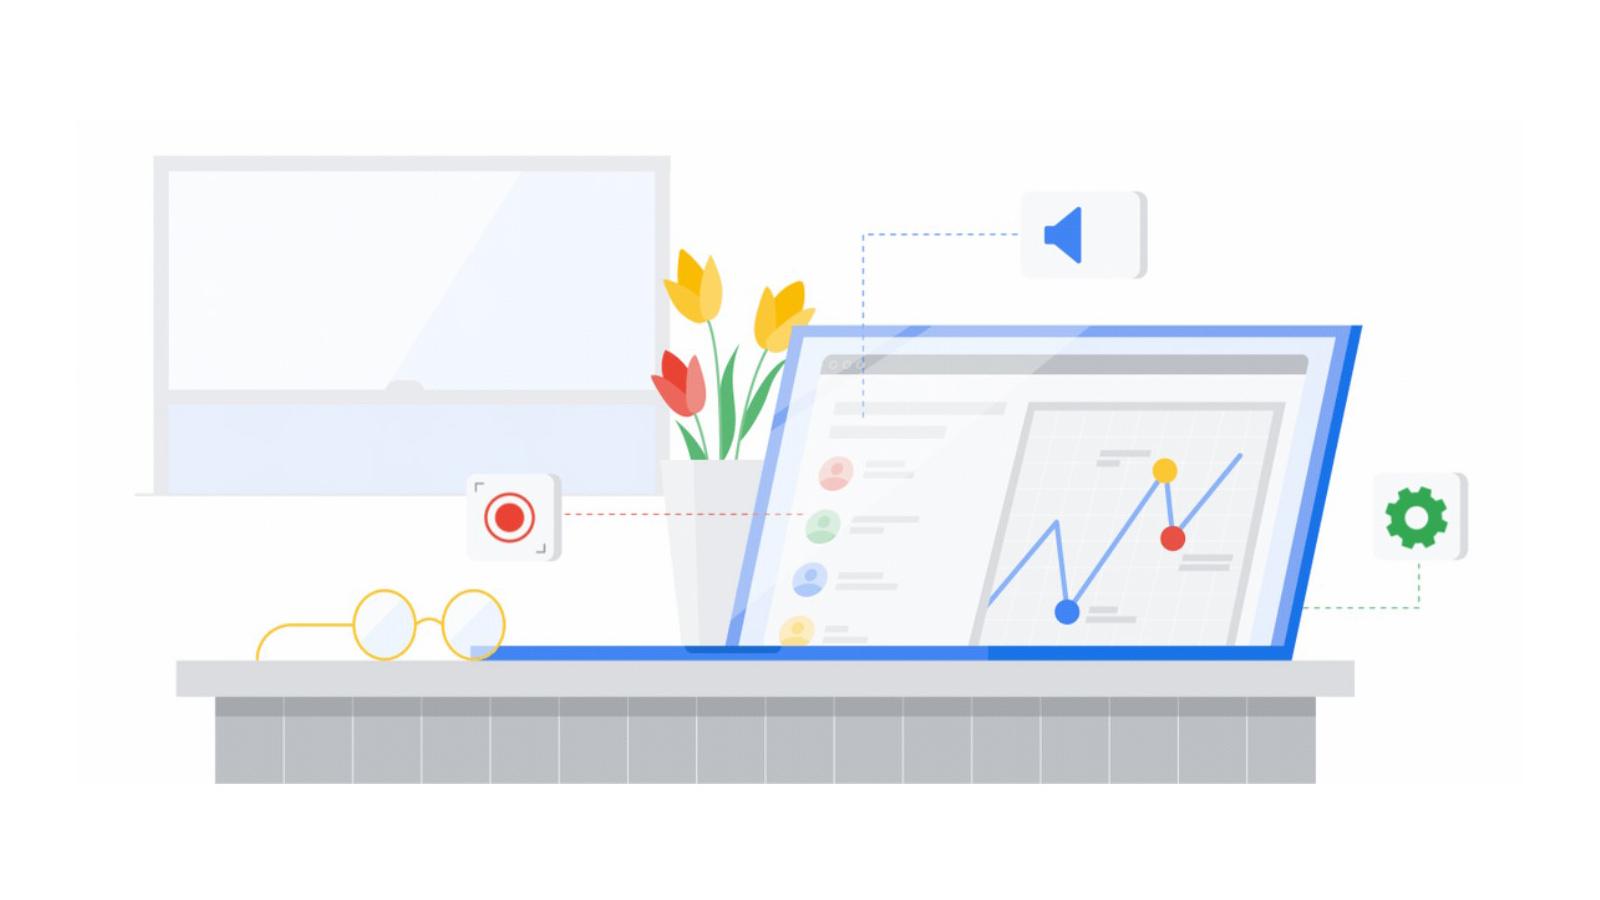 Google Chrome screen recording